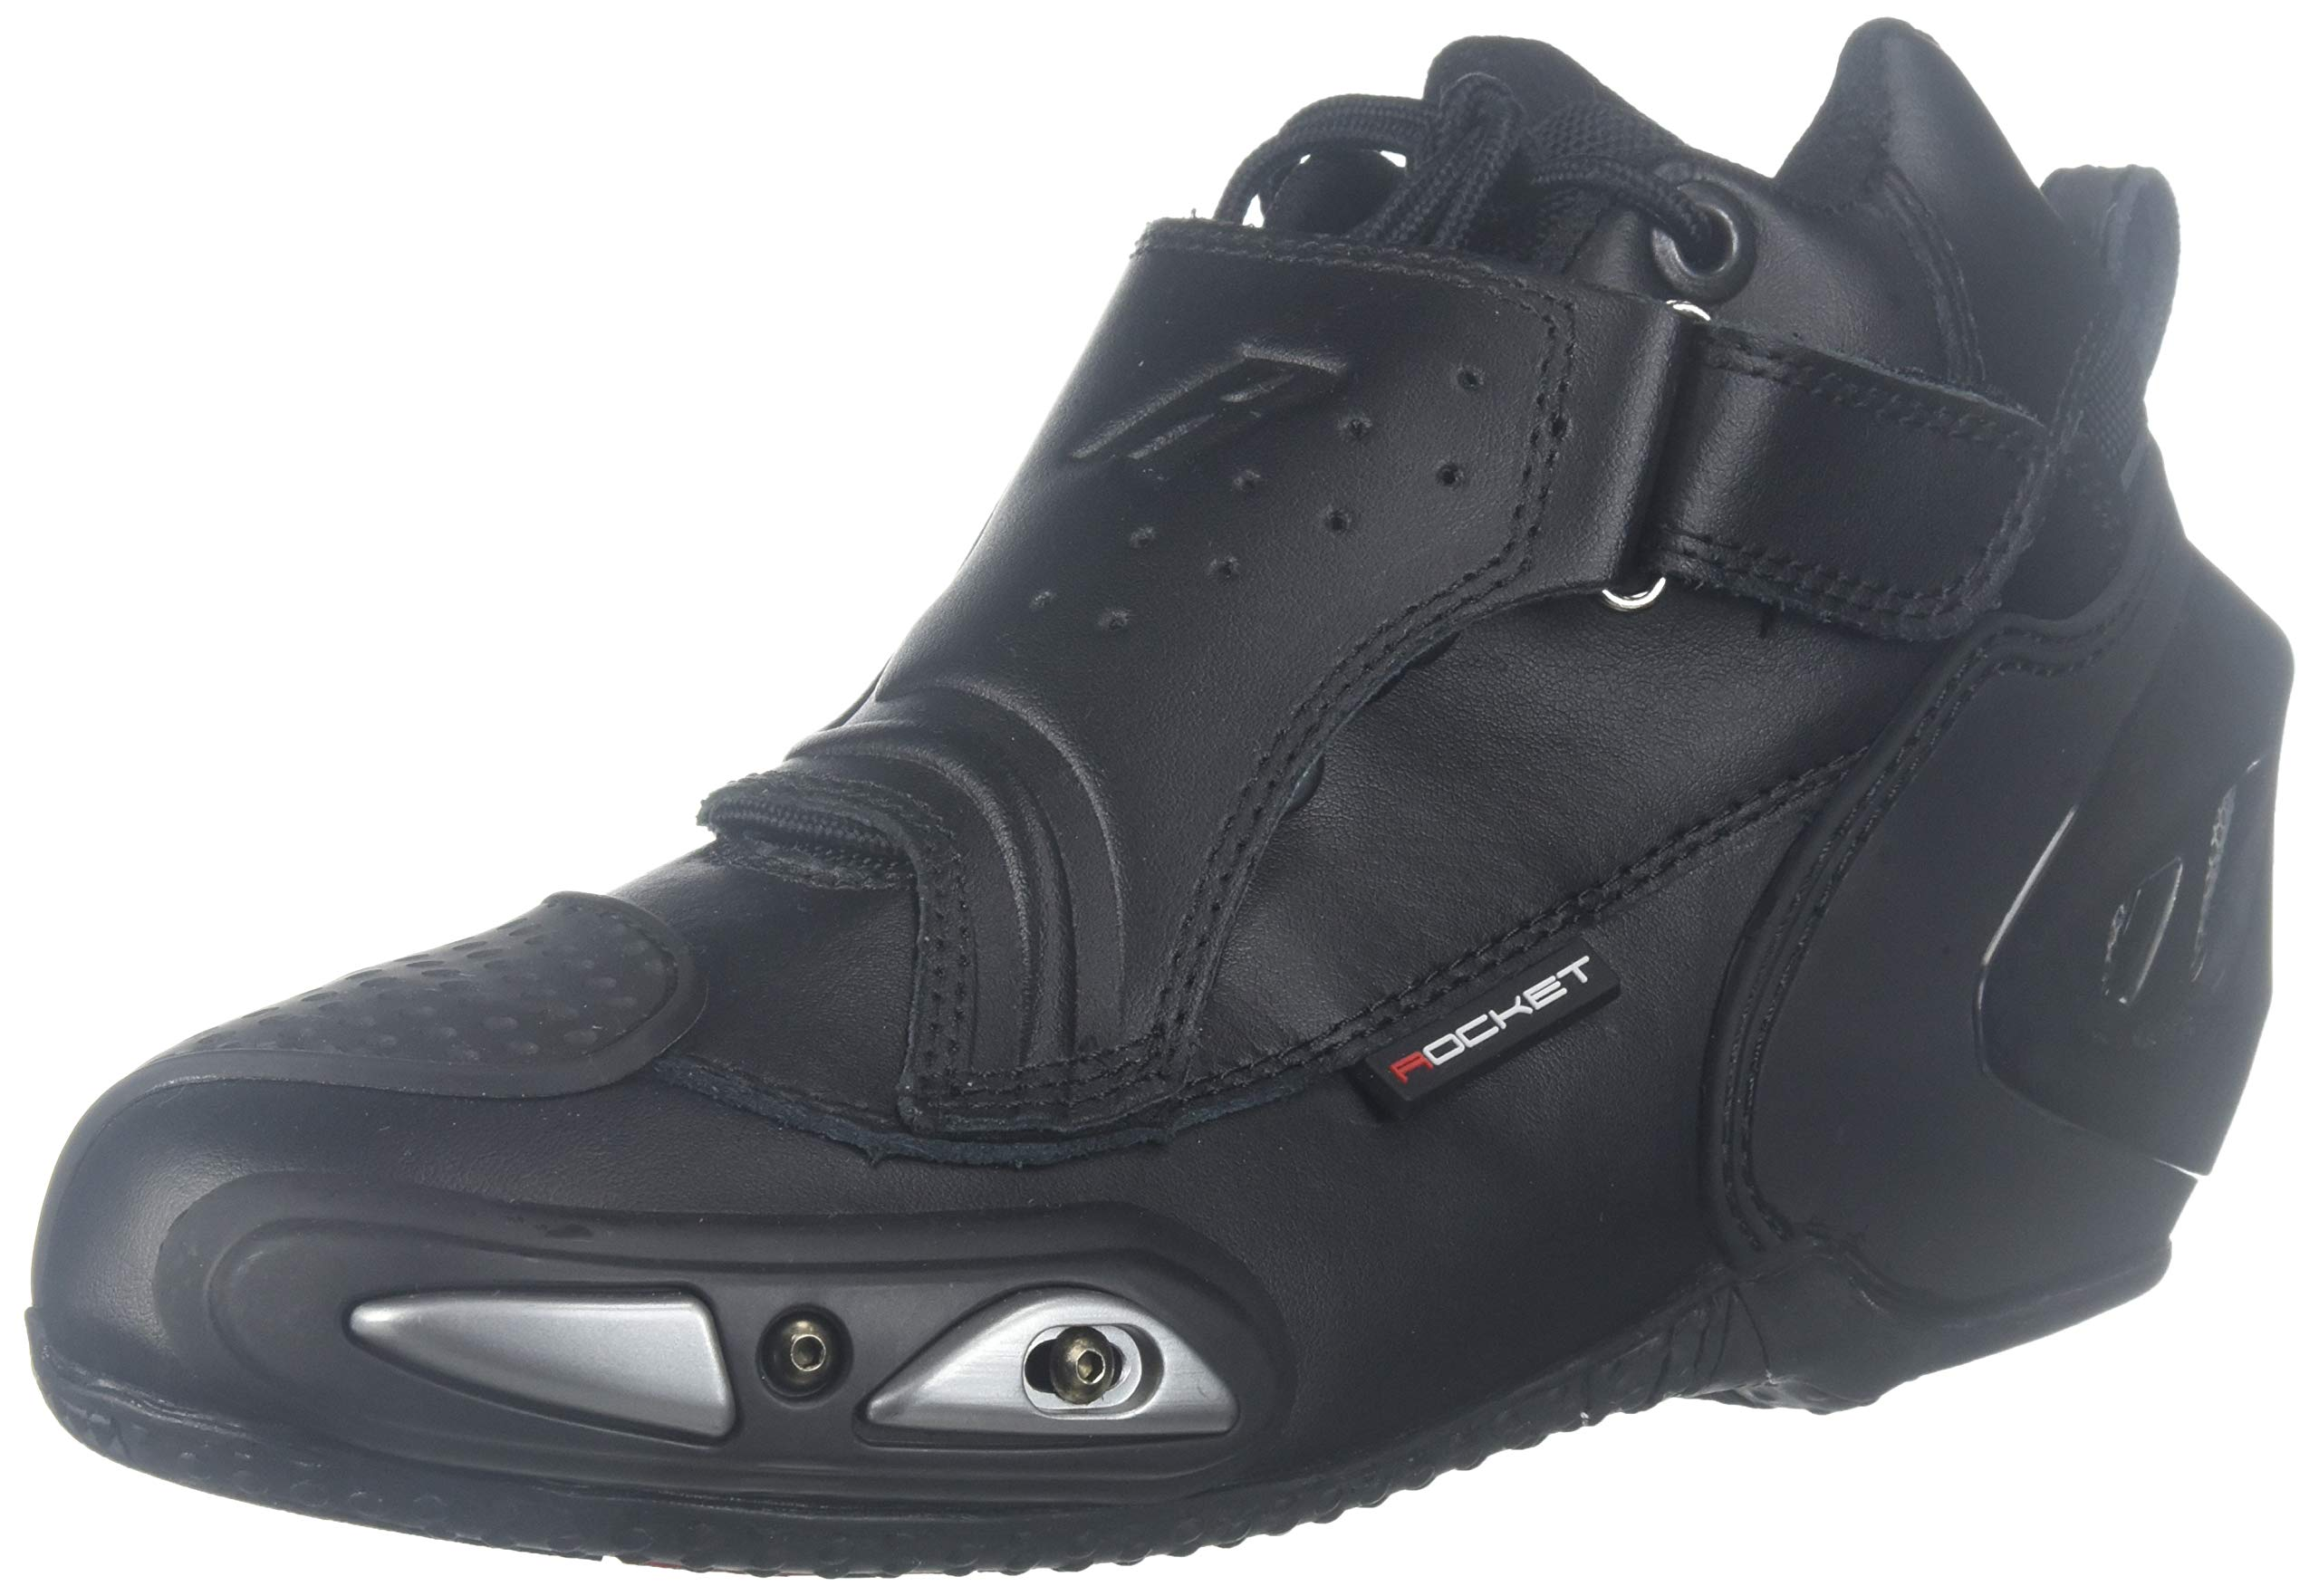 Joe Rocket Velocity VX-2 Men's Hybrid Boots (Black, Size 8)